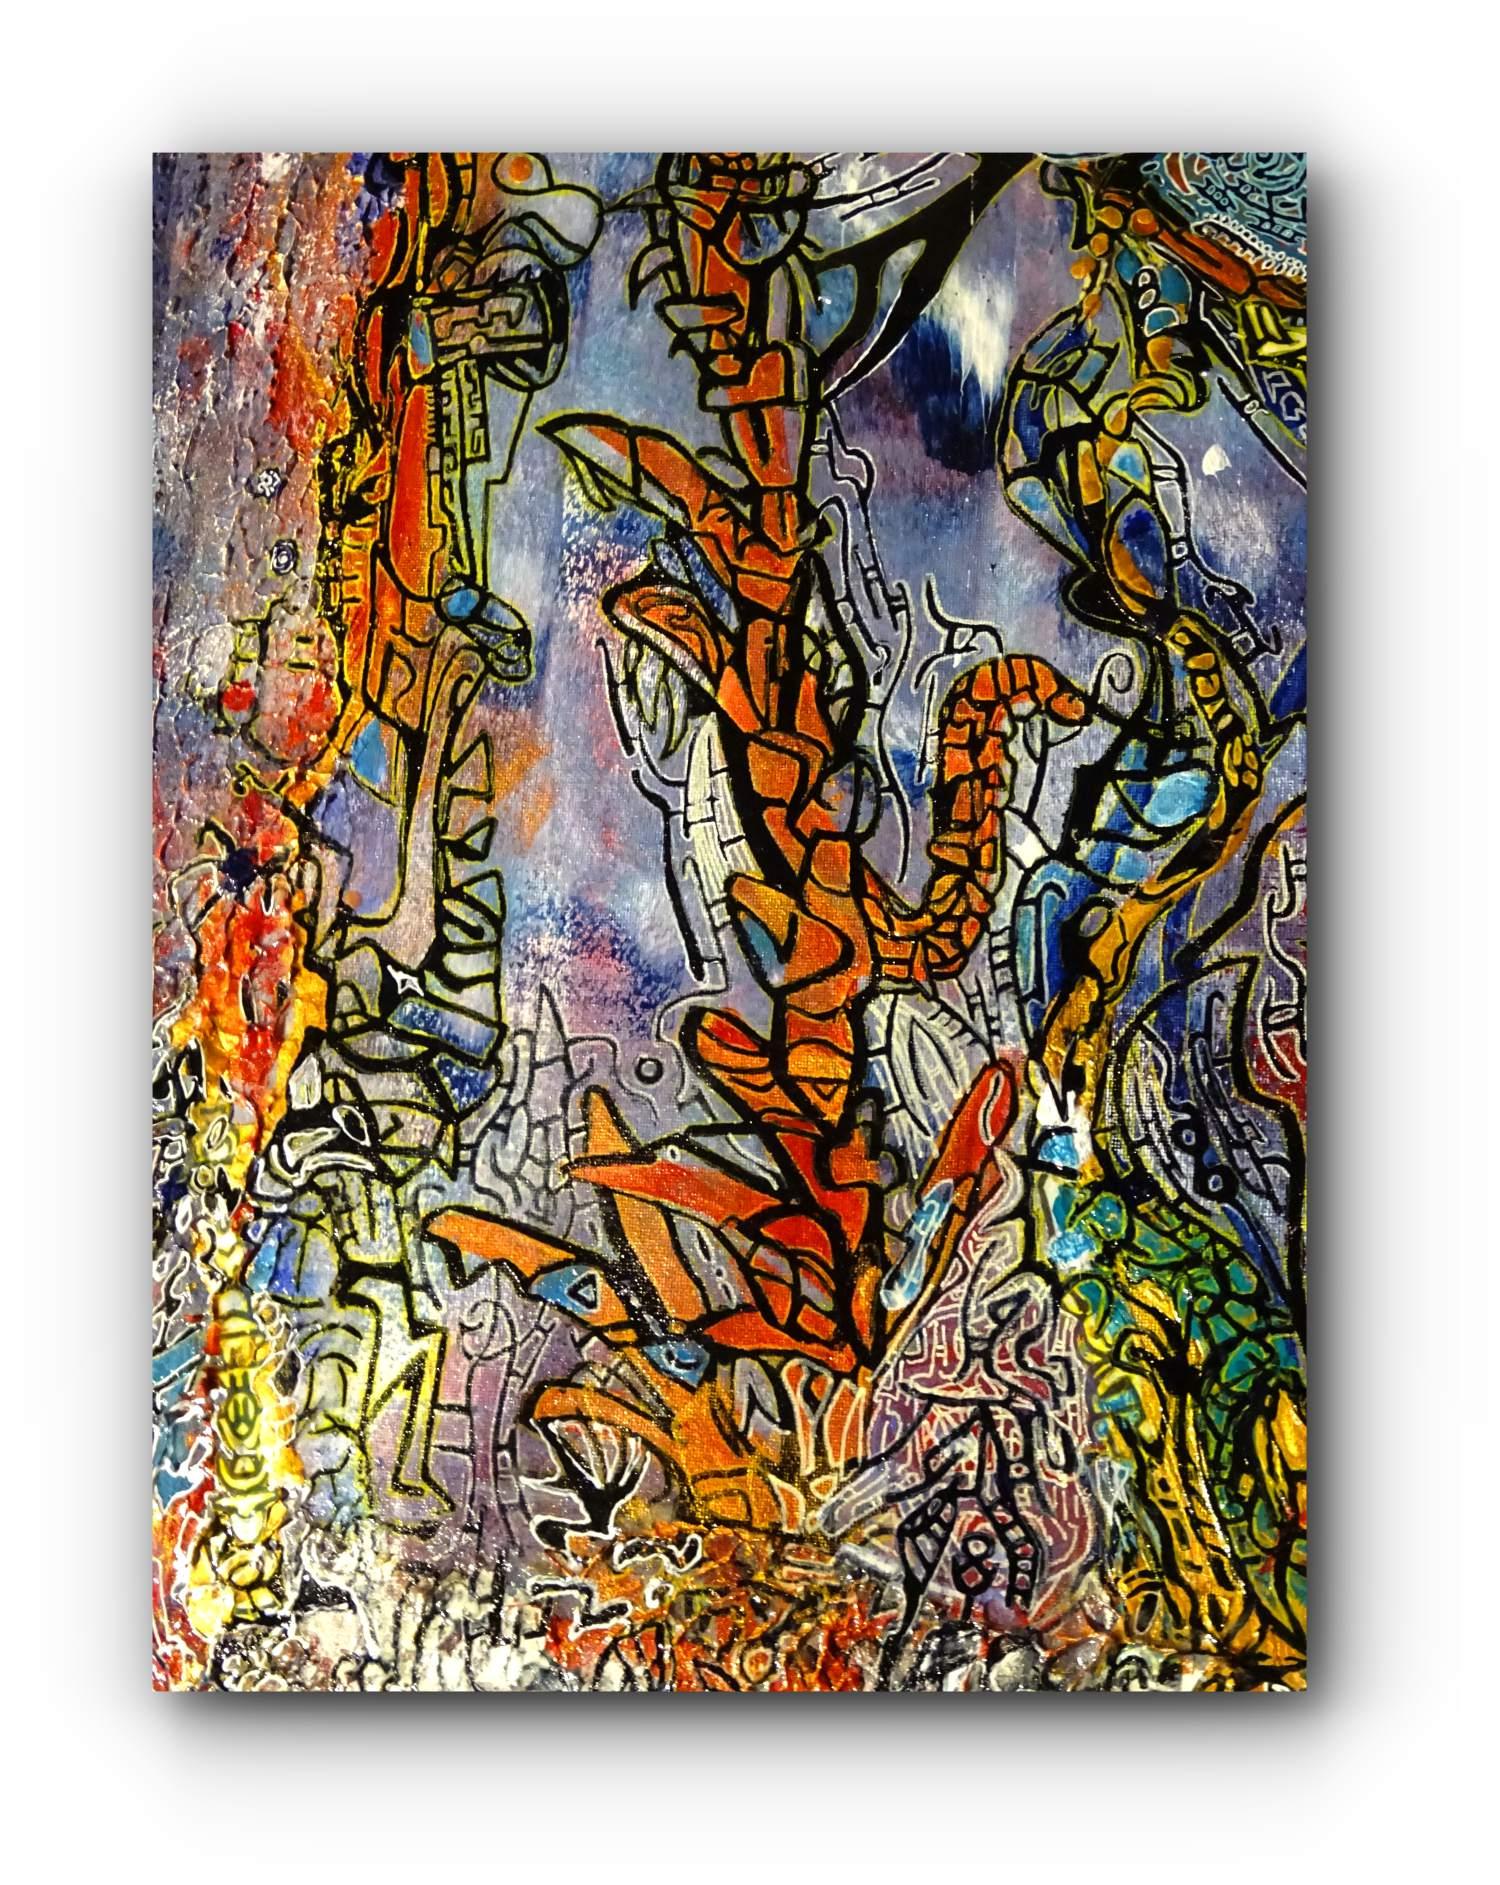 painting-detail-3-innerspace-artist-duo-ingress-vortices.jpg